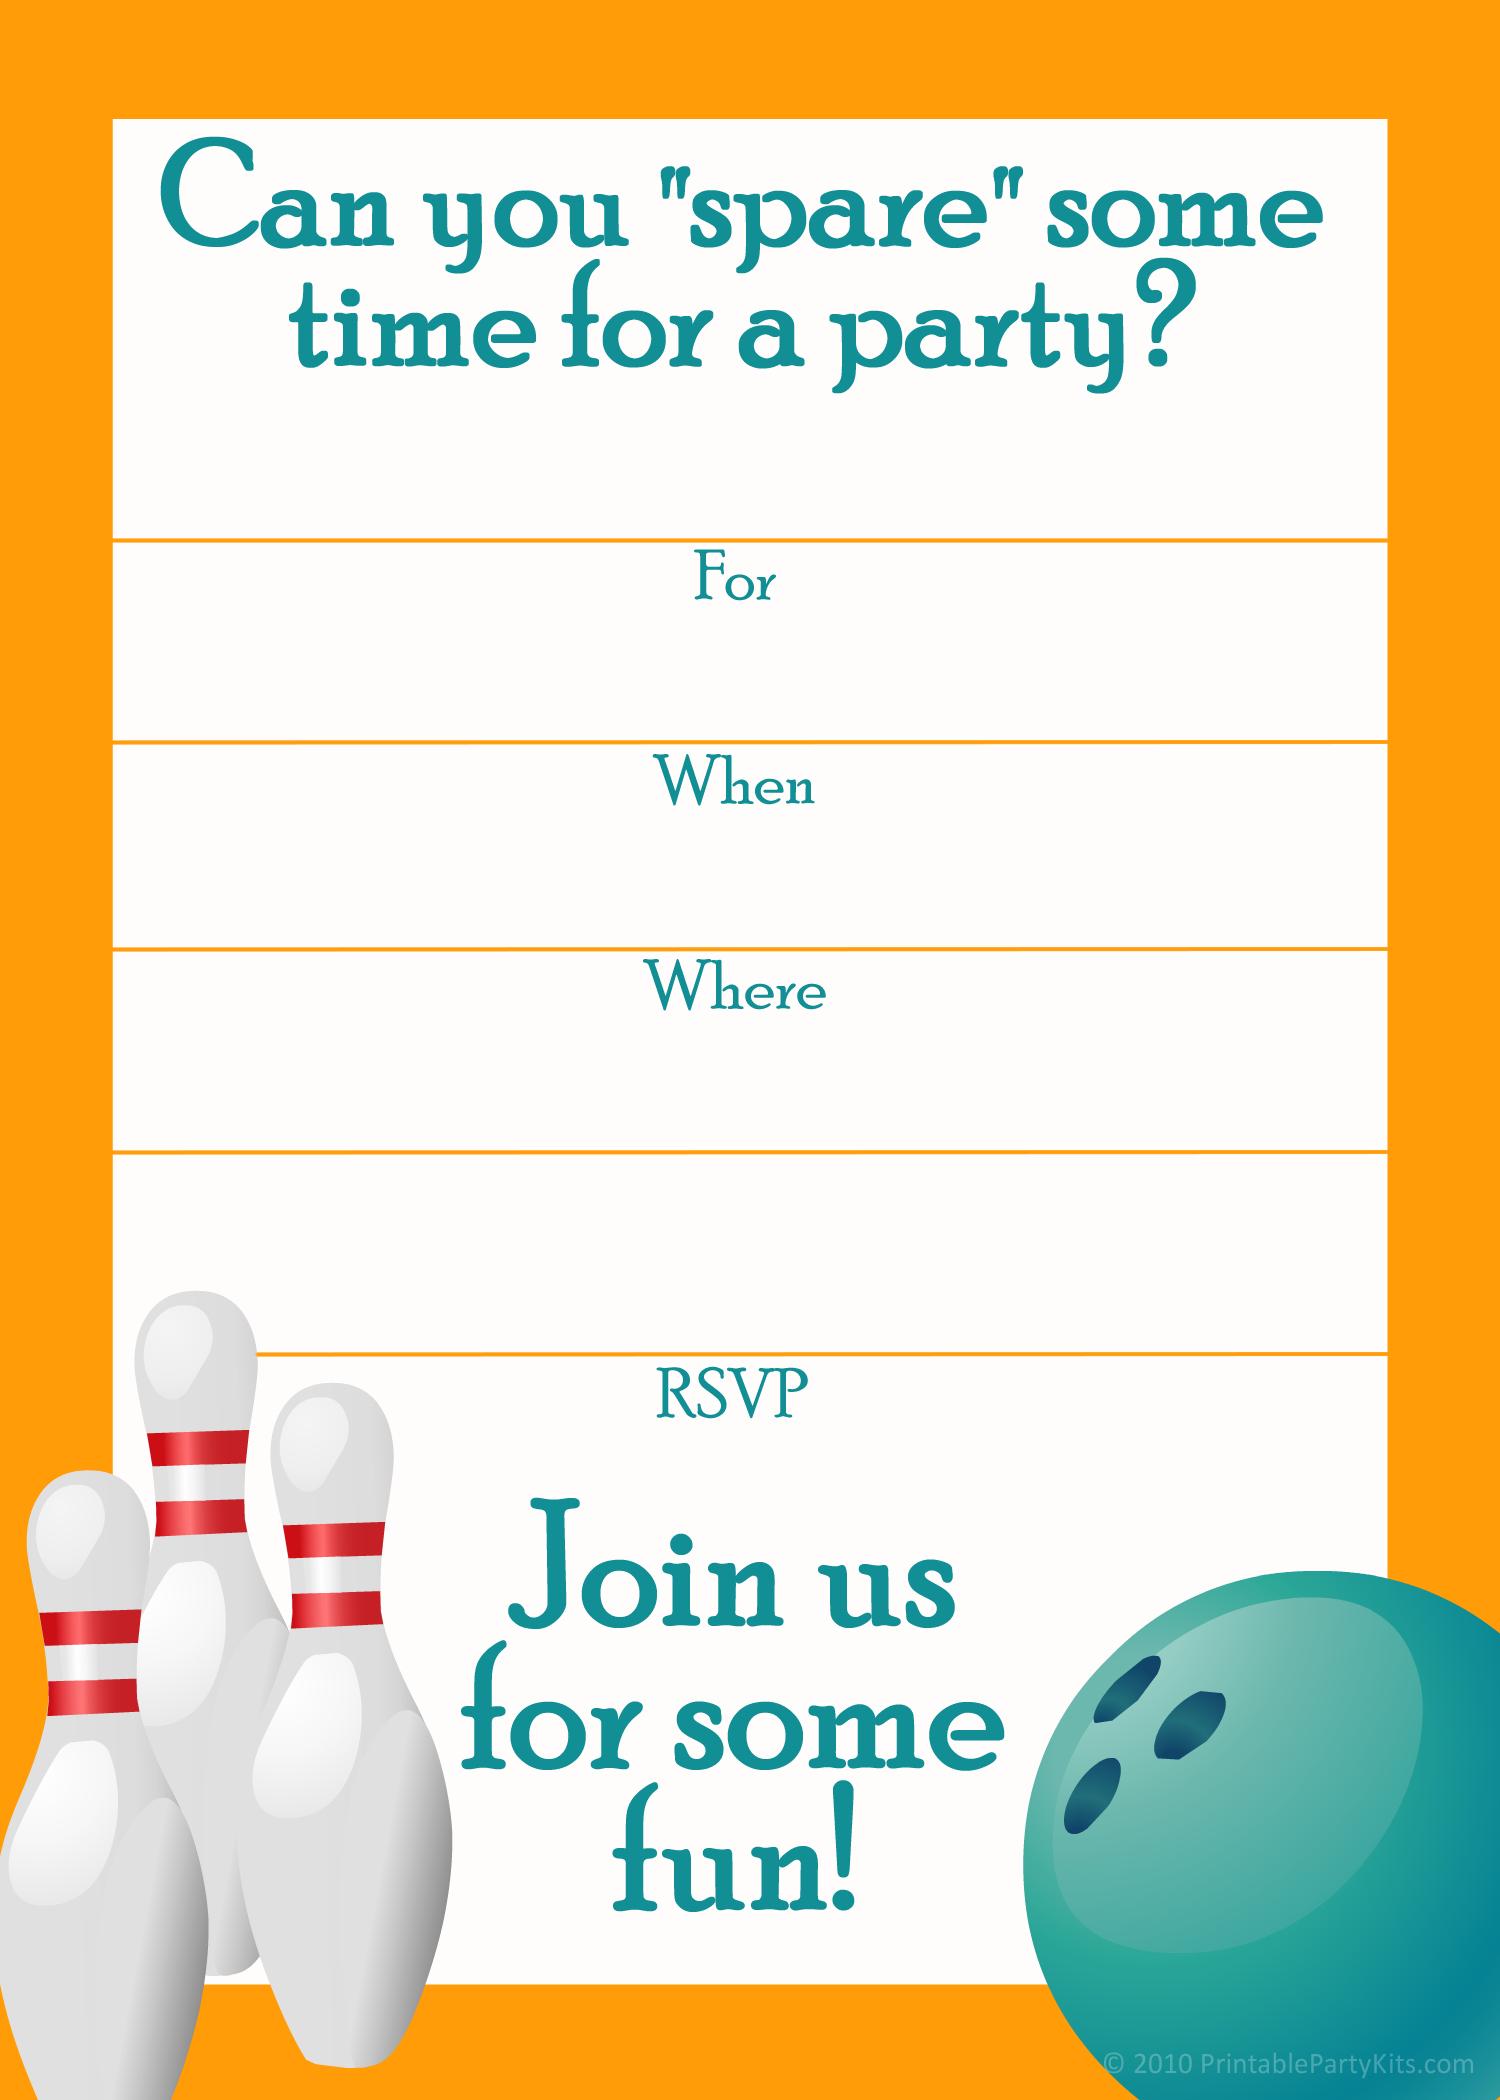 Free Printable Sports Birthday Party Invitations Templates | Party - Free Printable Bowling Invitation Templates